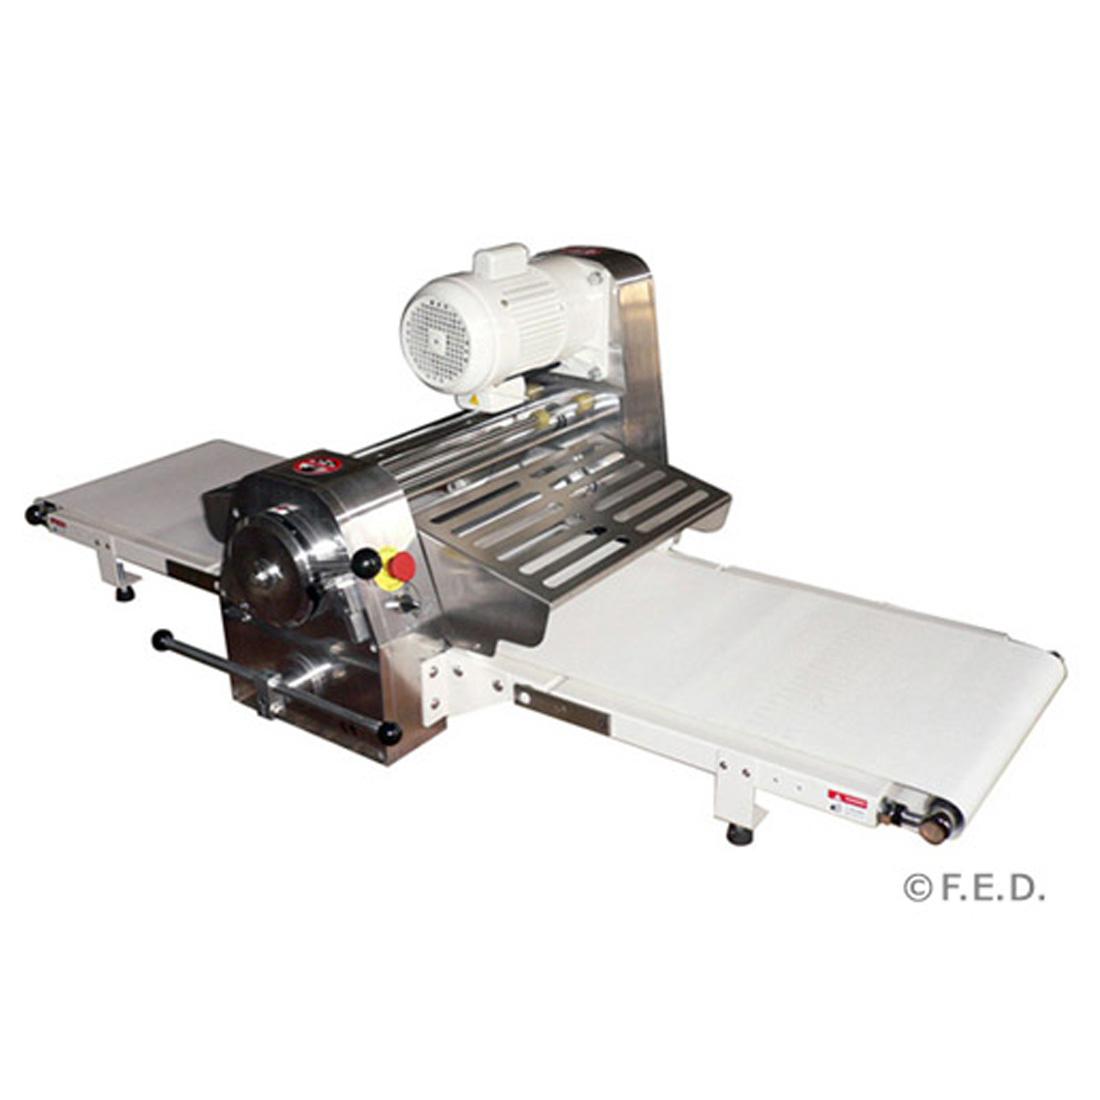 JDR-520B Bench Dough Sheeter